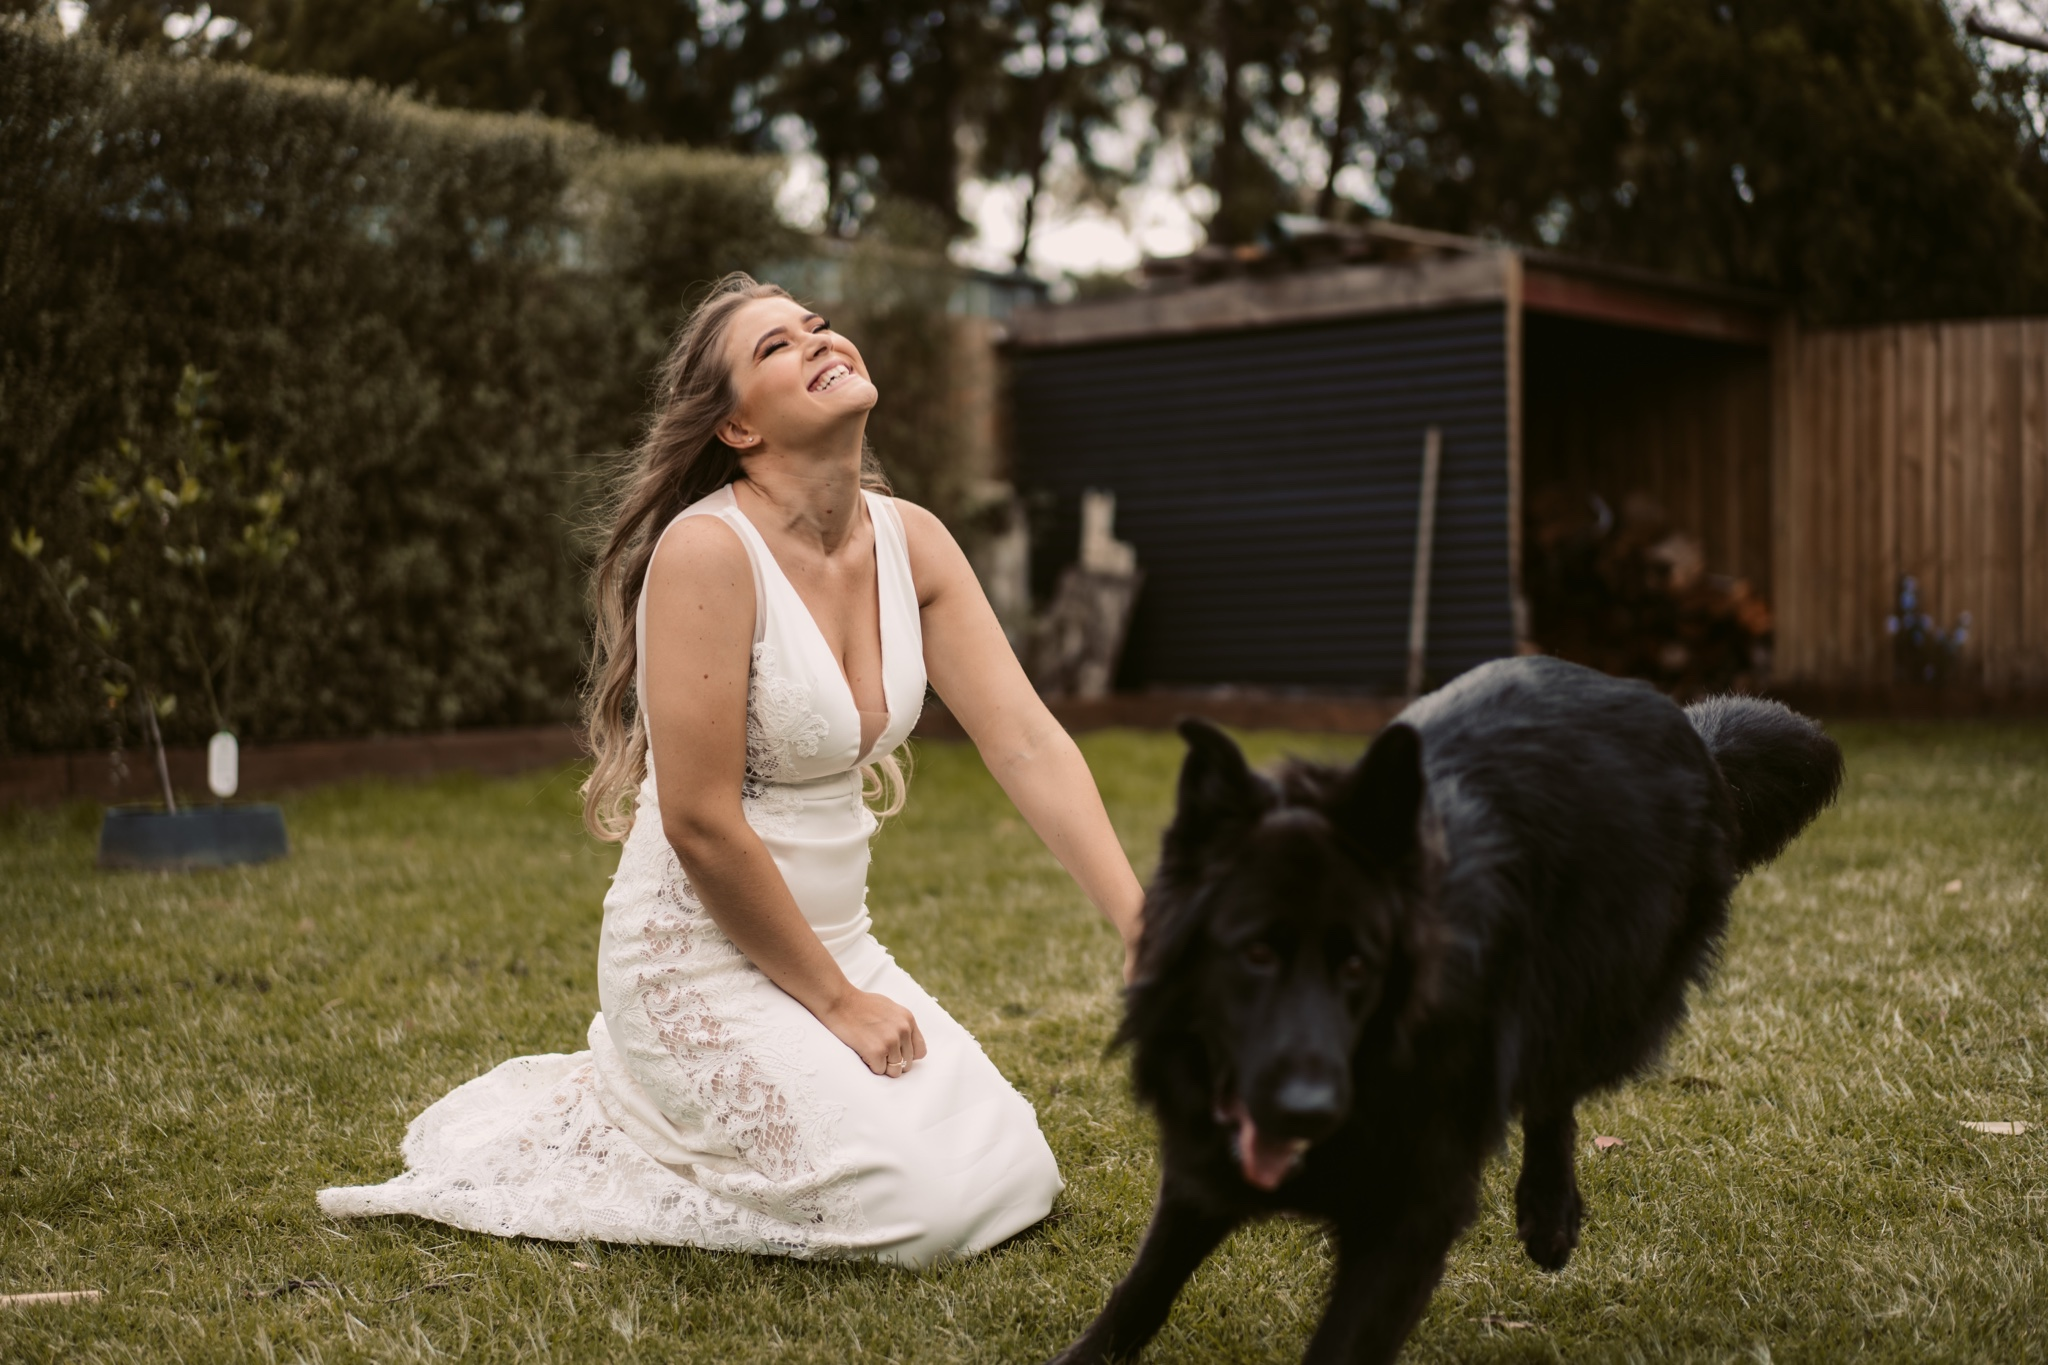 Mornington Peninsula Wedding Photography28.jpg